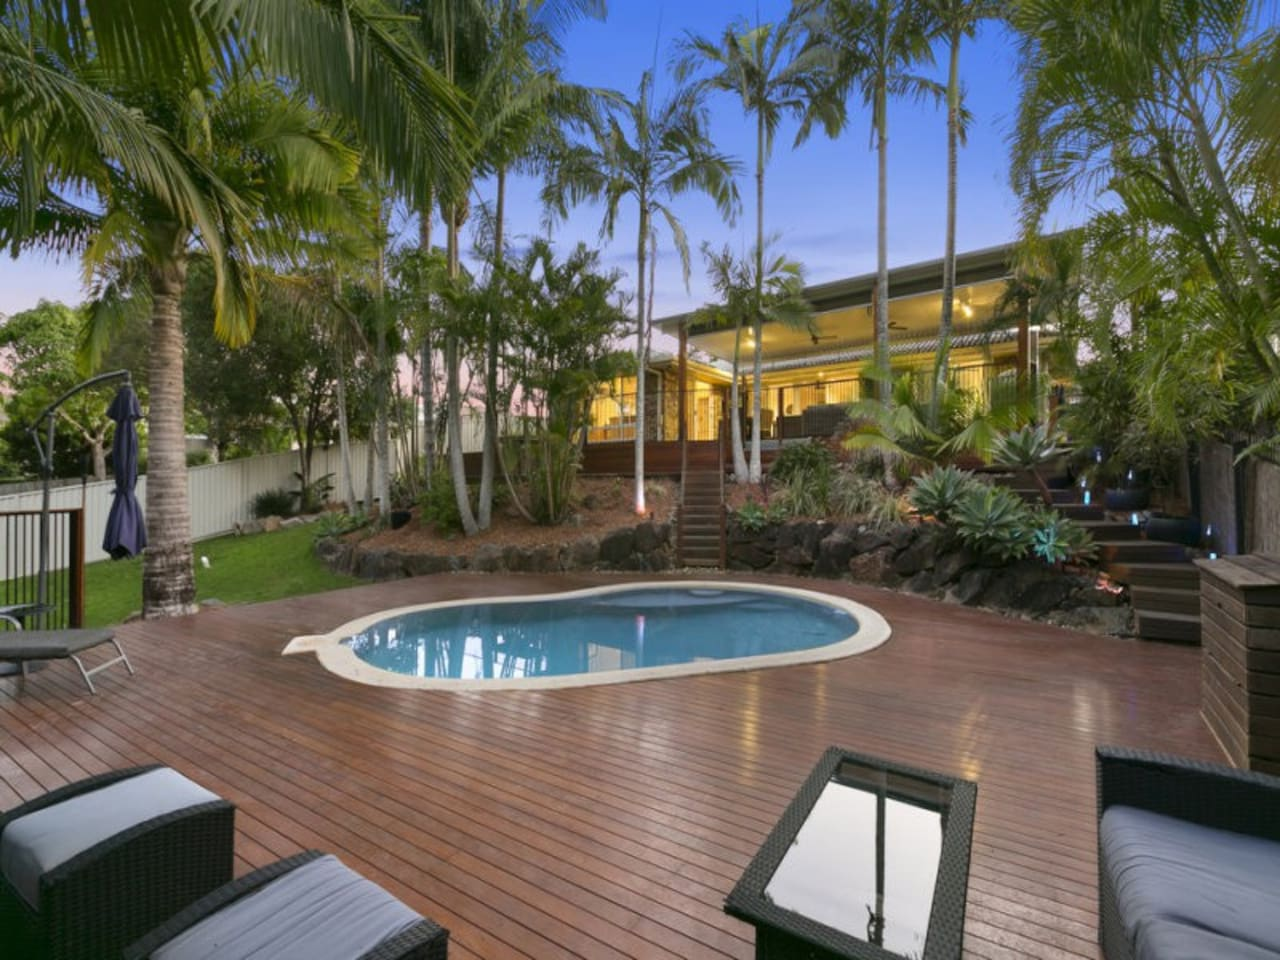 Tropical backyard with pool